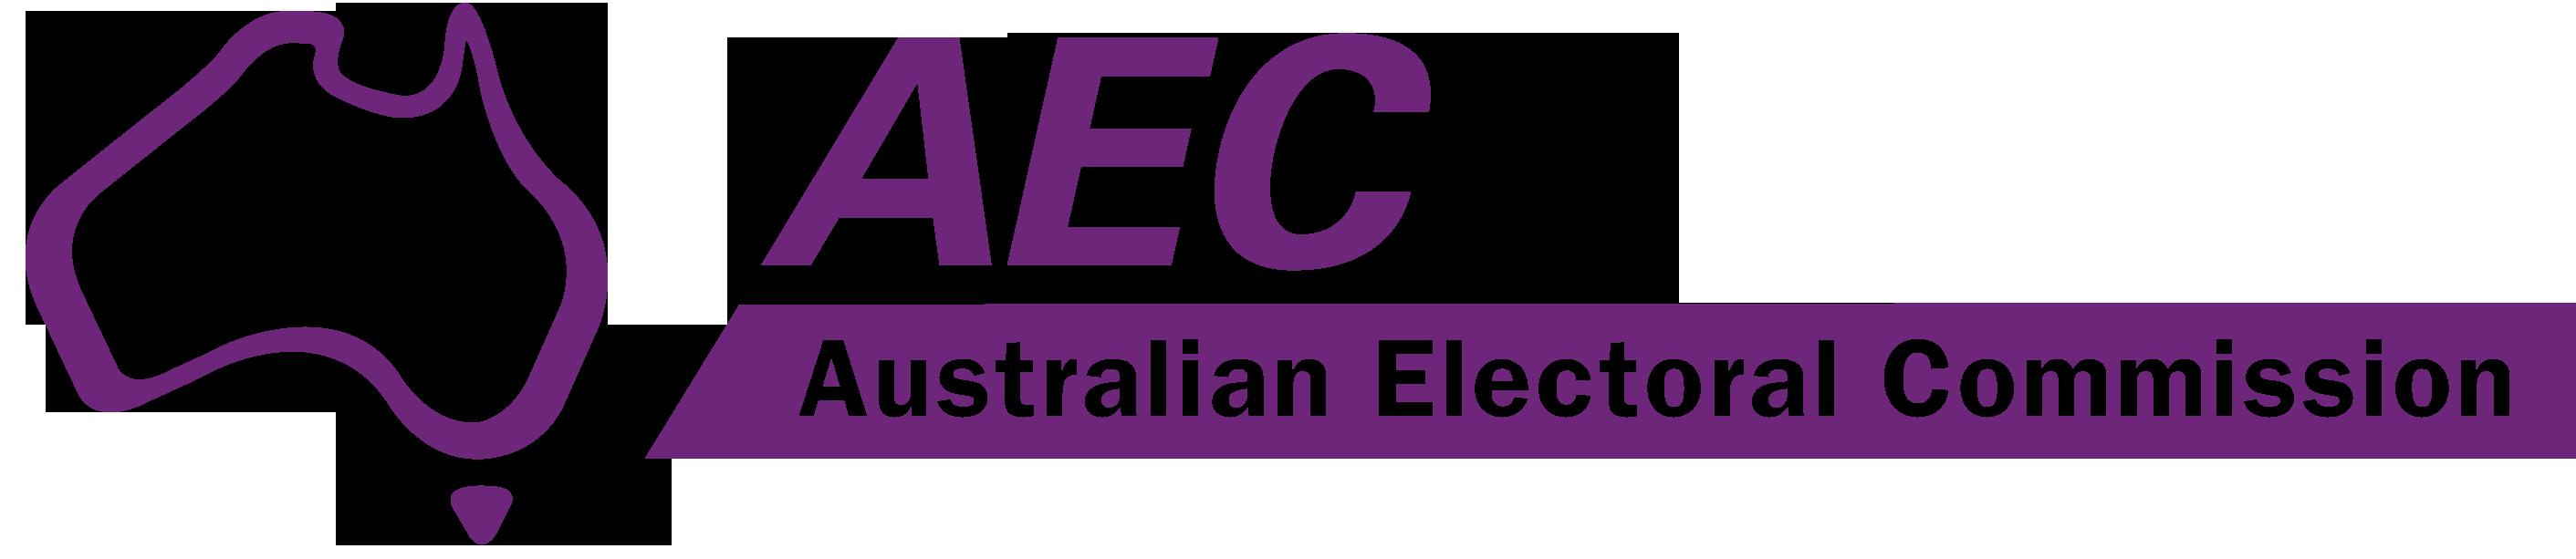 AEC-logo-RGB_(1).png